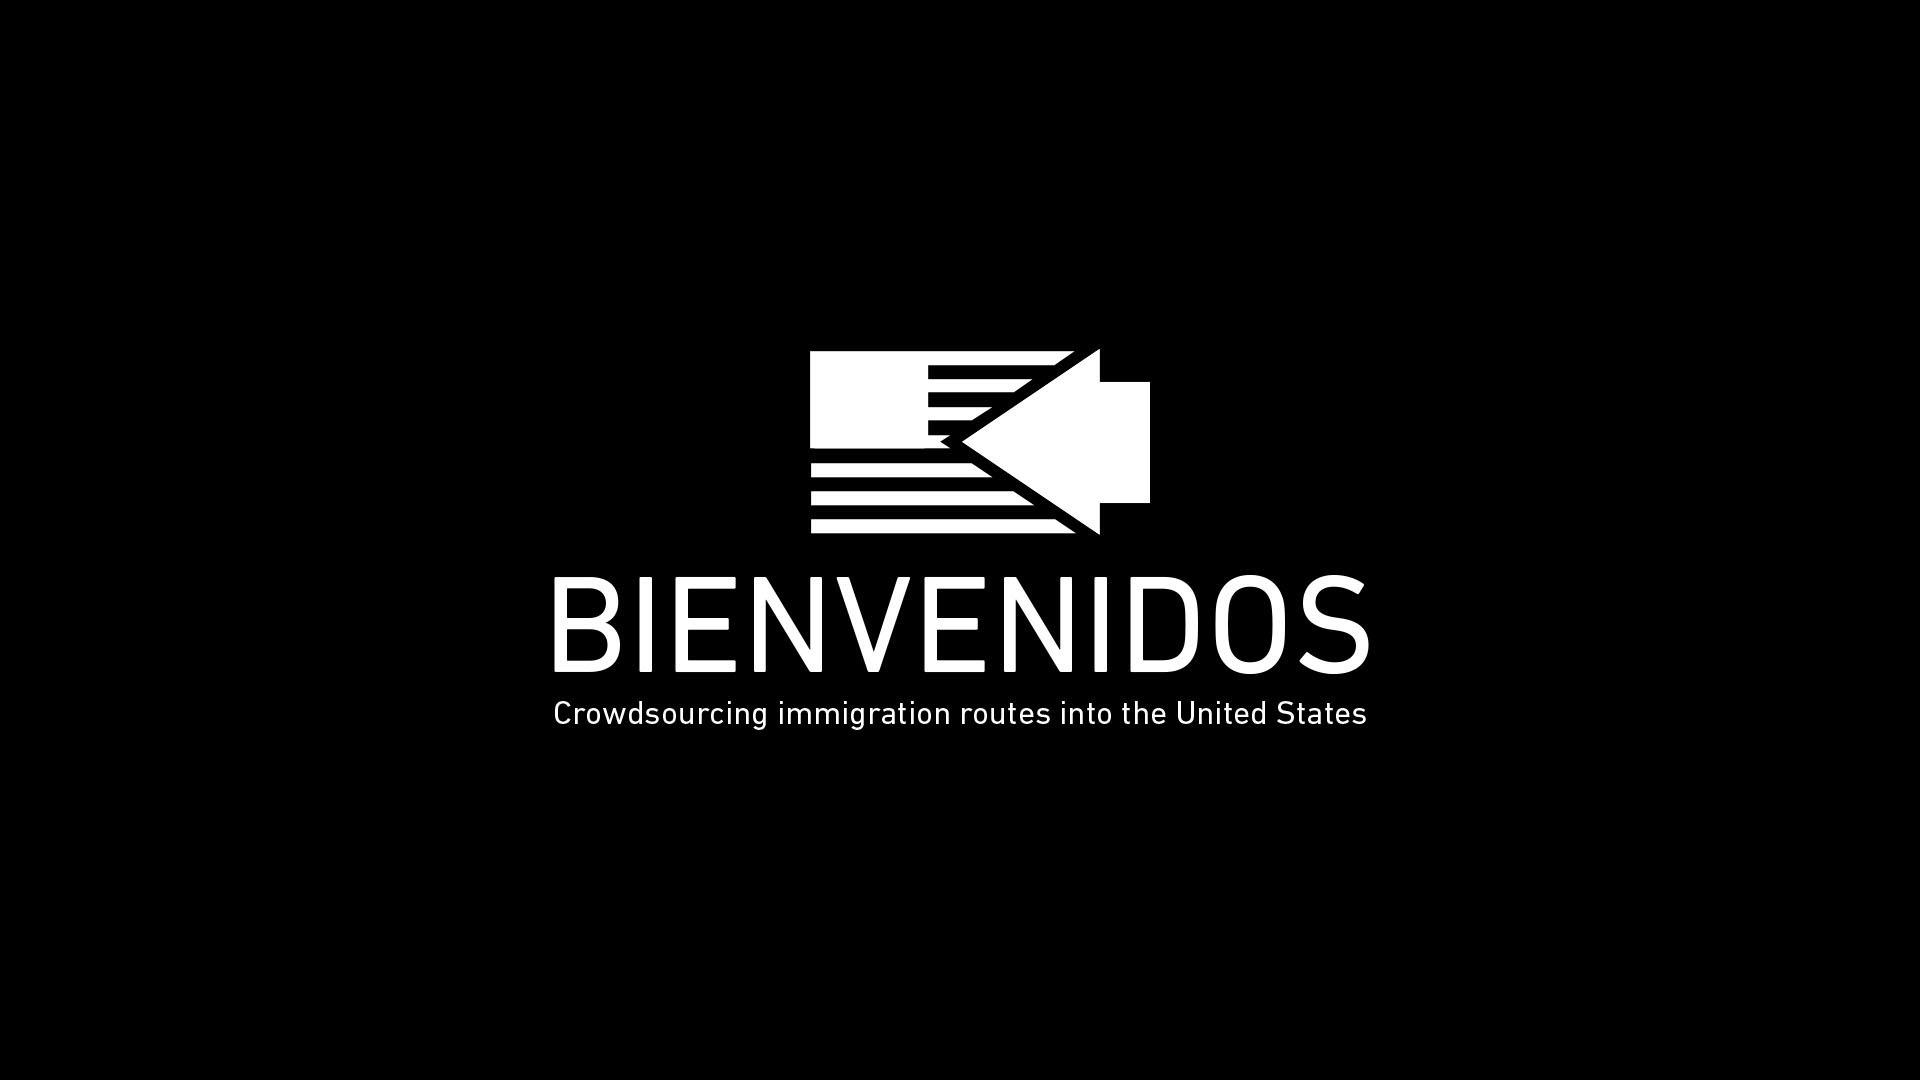 BIENVENIDOS_BLCK.jpg